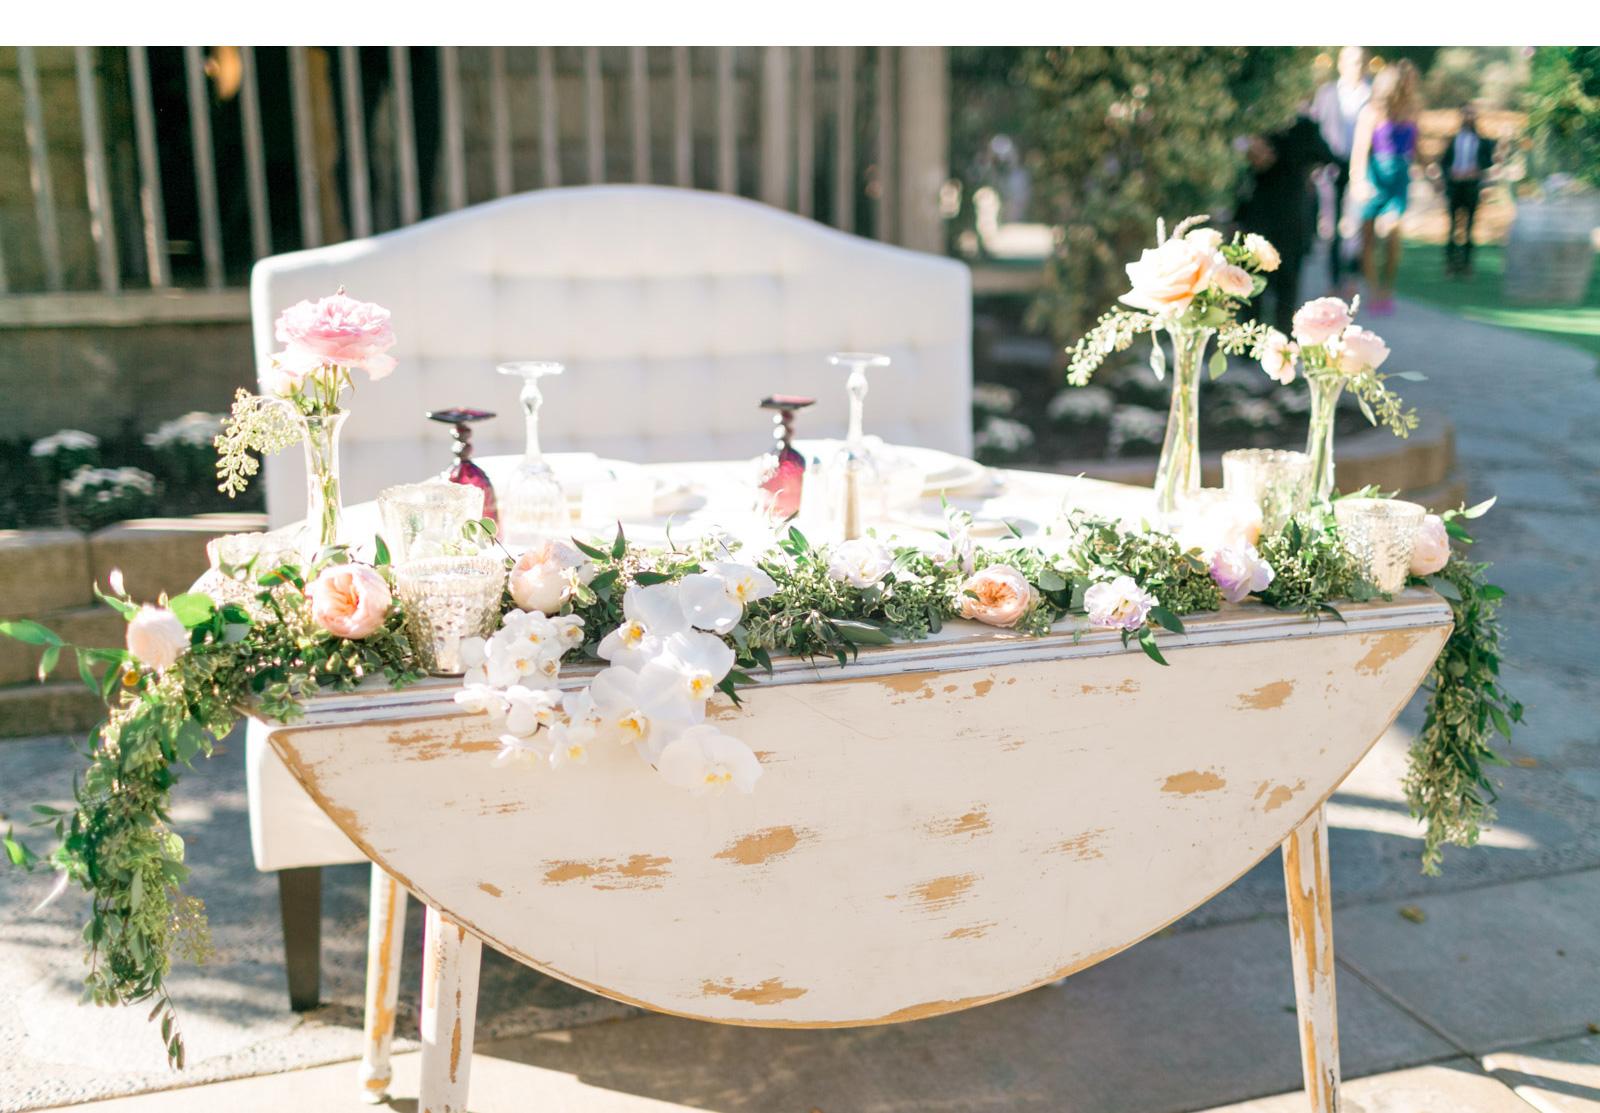 Temecula-Winery-Wedding-Natalie-Schutt-Photography_05.jpg